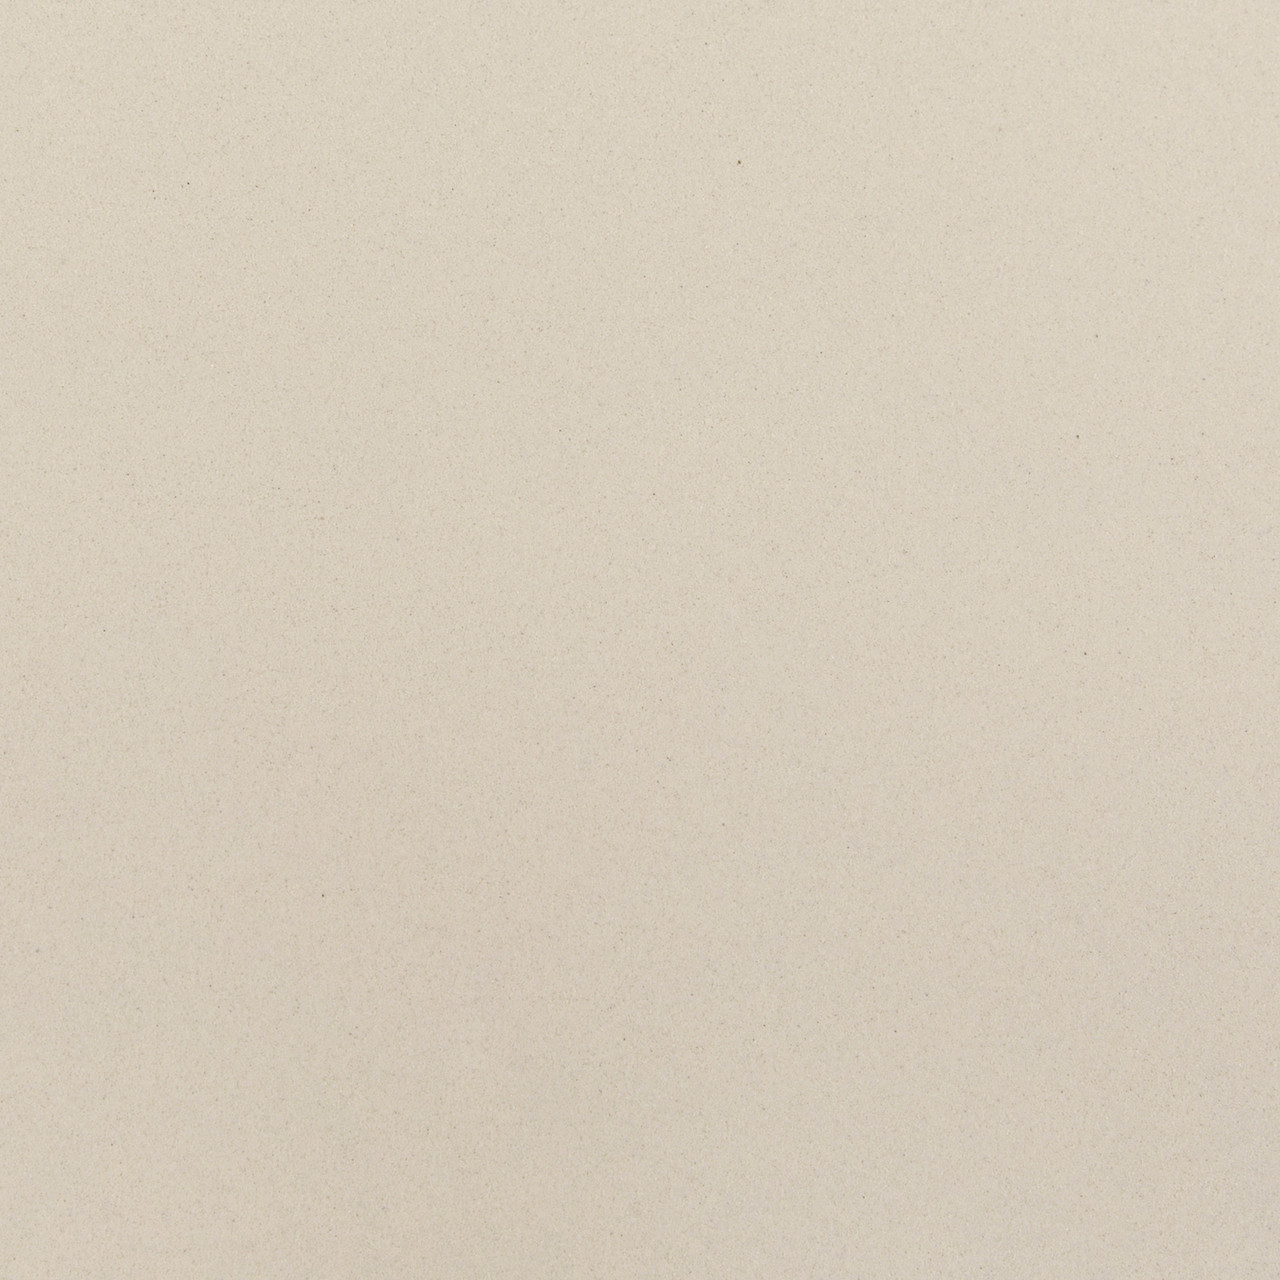 Плитка для пола ГРЕС 12 мм MN 000 200x200 /48